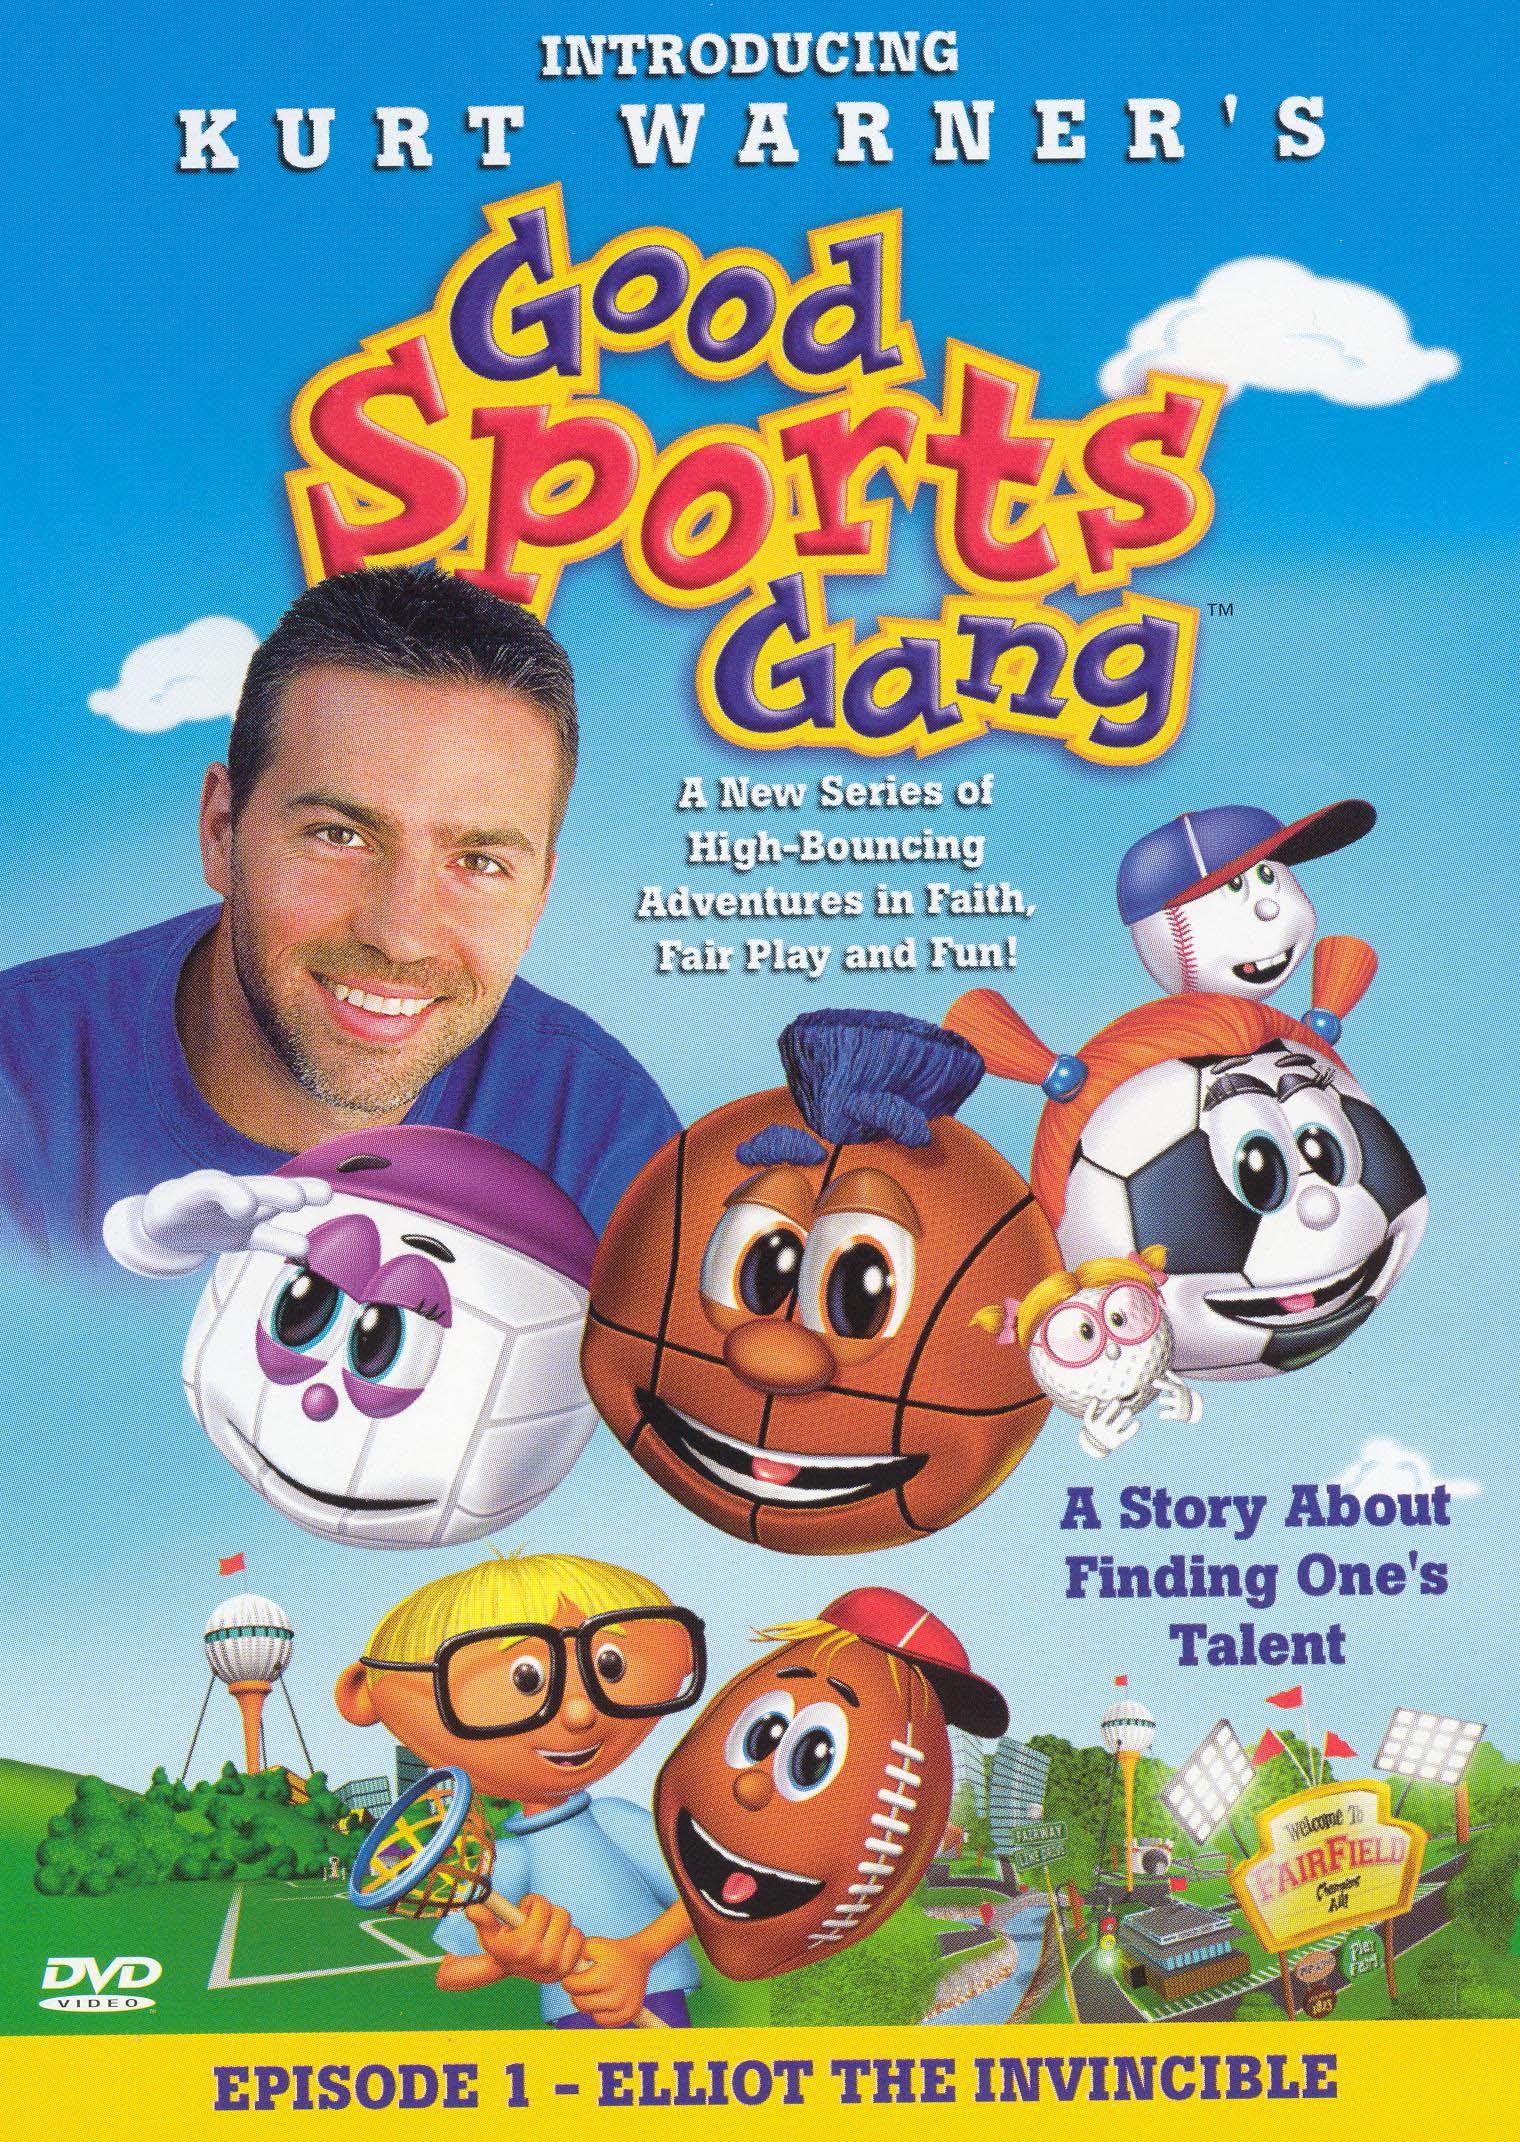 Kurt Warner's Good Sports Gang, Episode 1: Elliot the Invincible